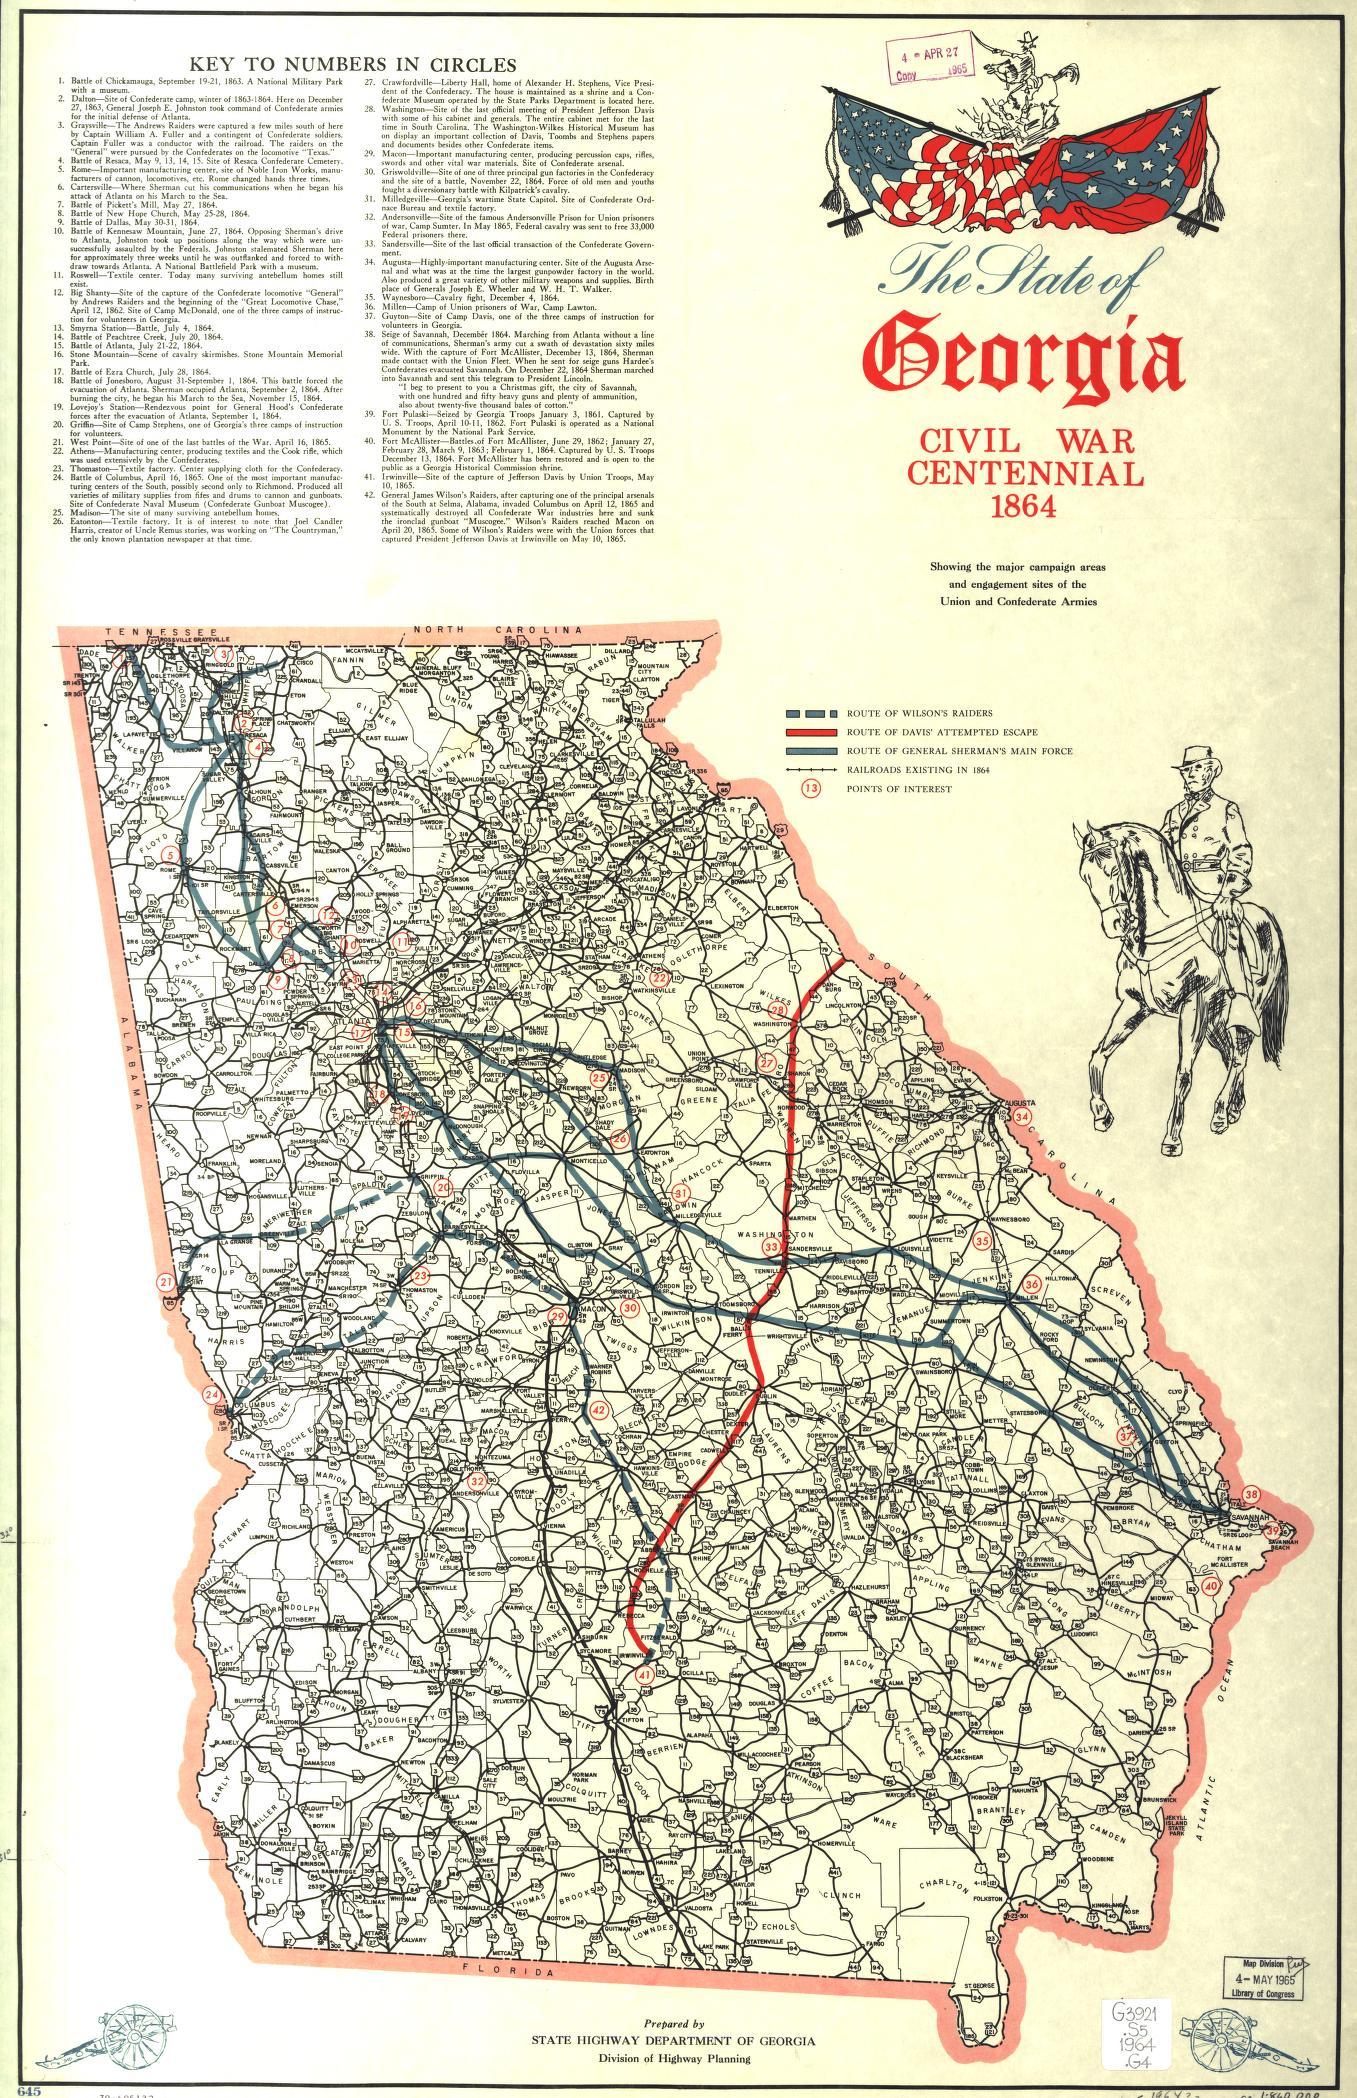 The State Of Georgia Civil War Centennial Showing